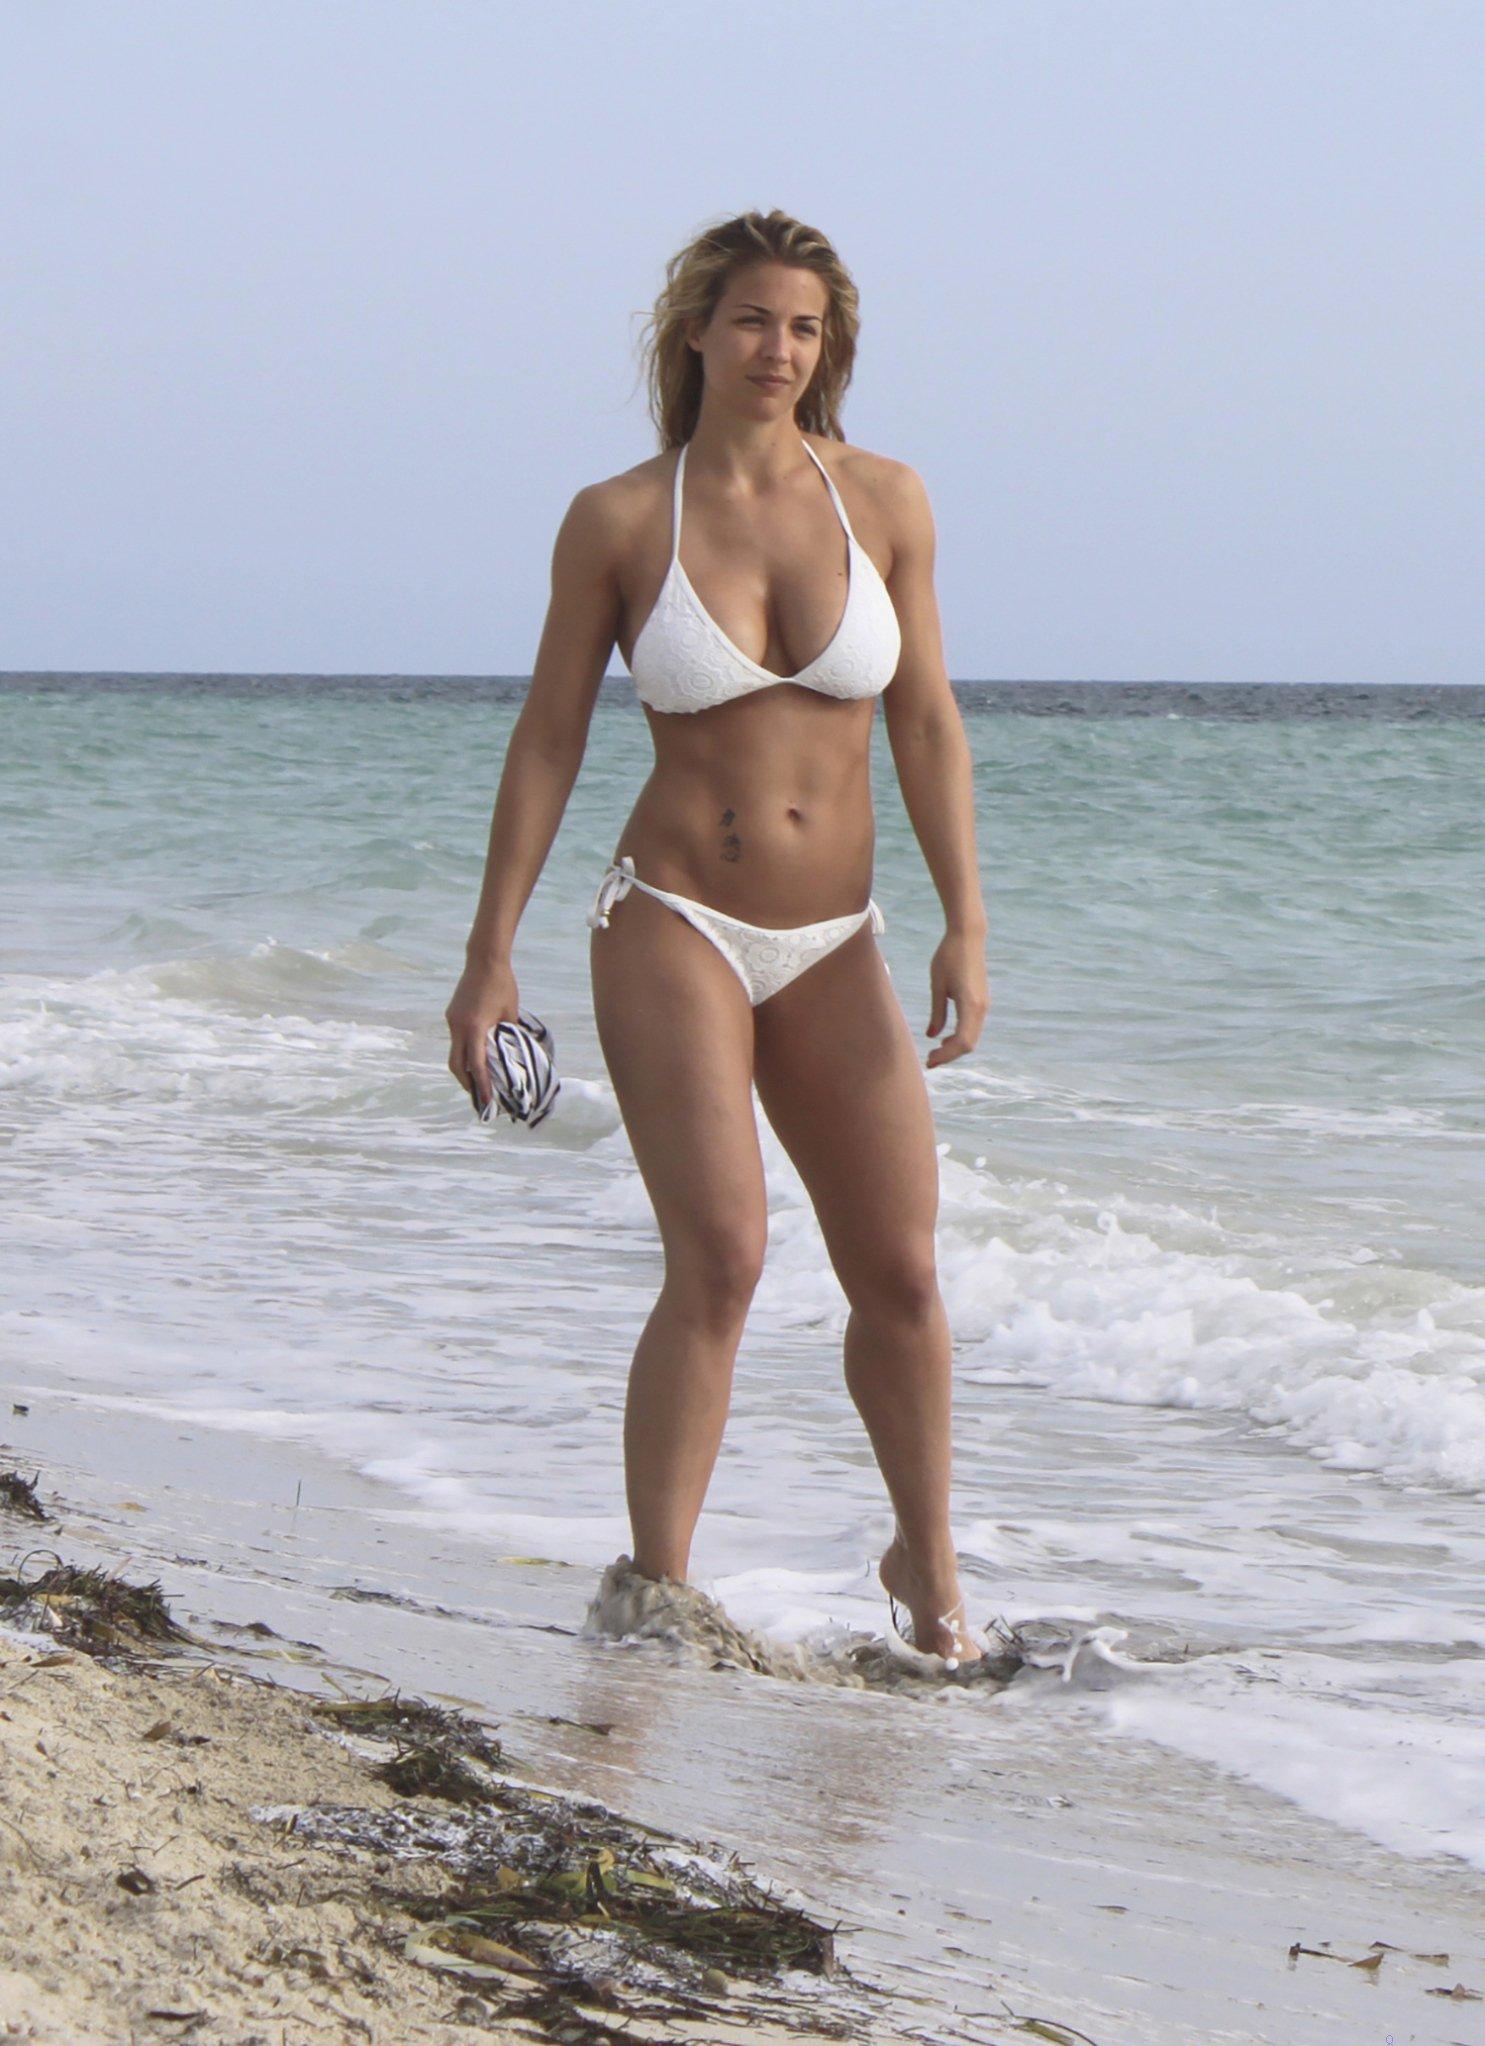 Gemma Atkinson amp Roxanne Pallett Sexy 29 Photos